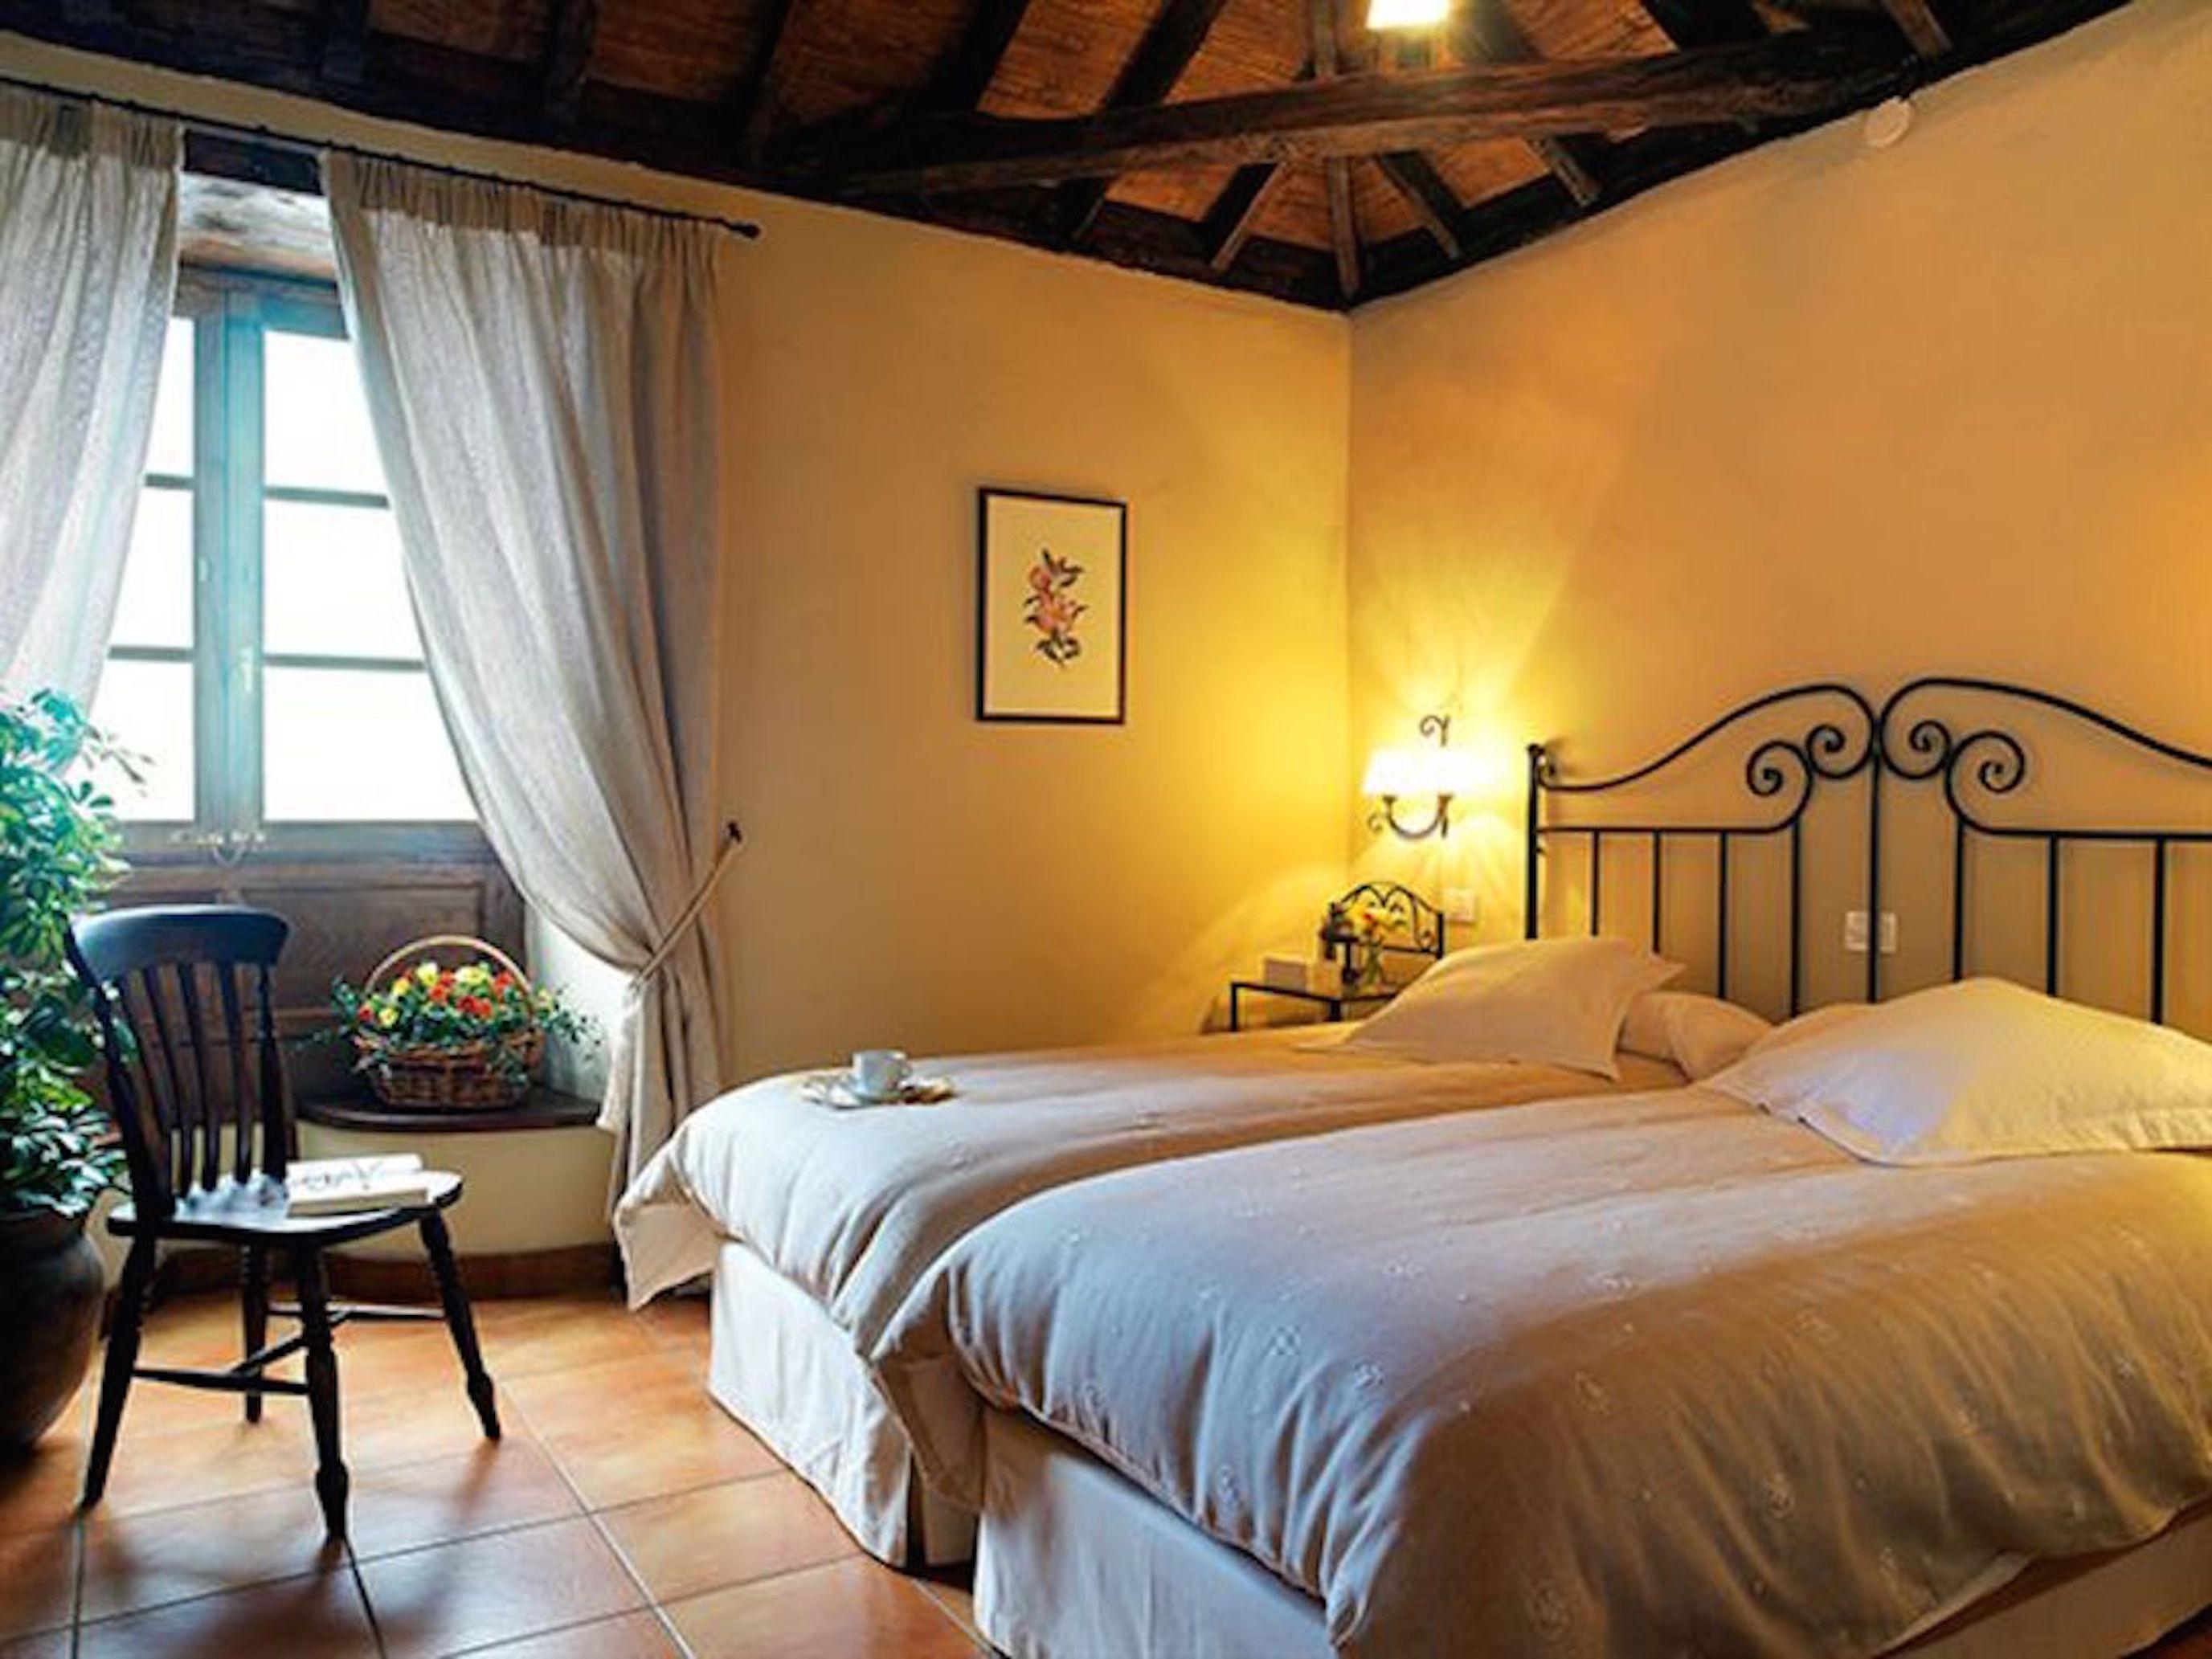 Maison de vacances La Hacienda, Free Wifi Grill (2196689), Garachico, Ténérife, Iles Canaries, Espagne, image 22